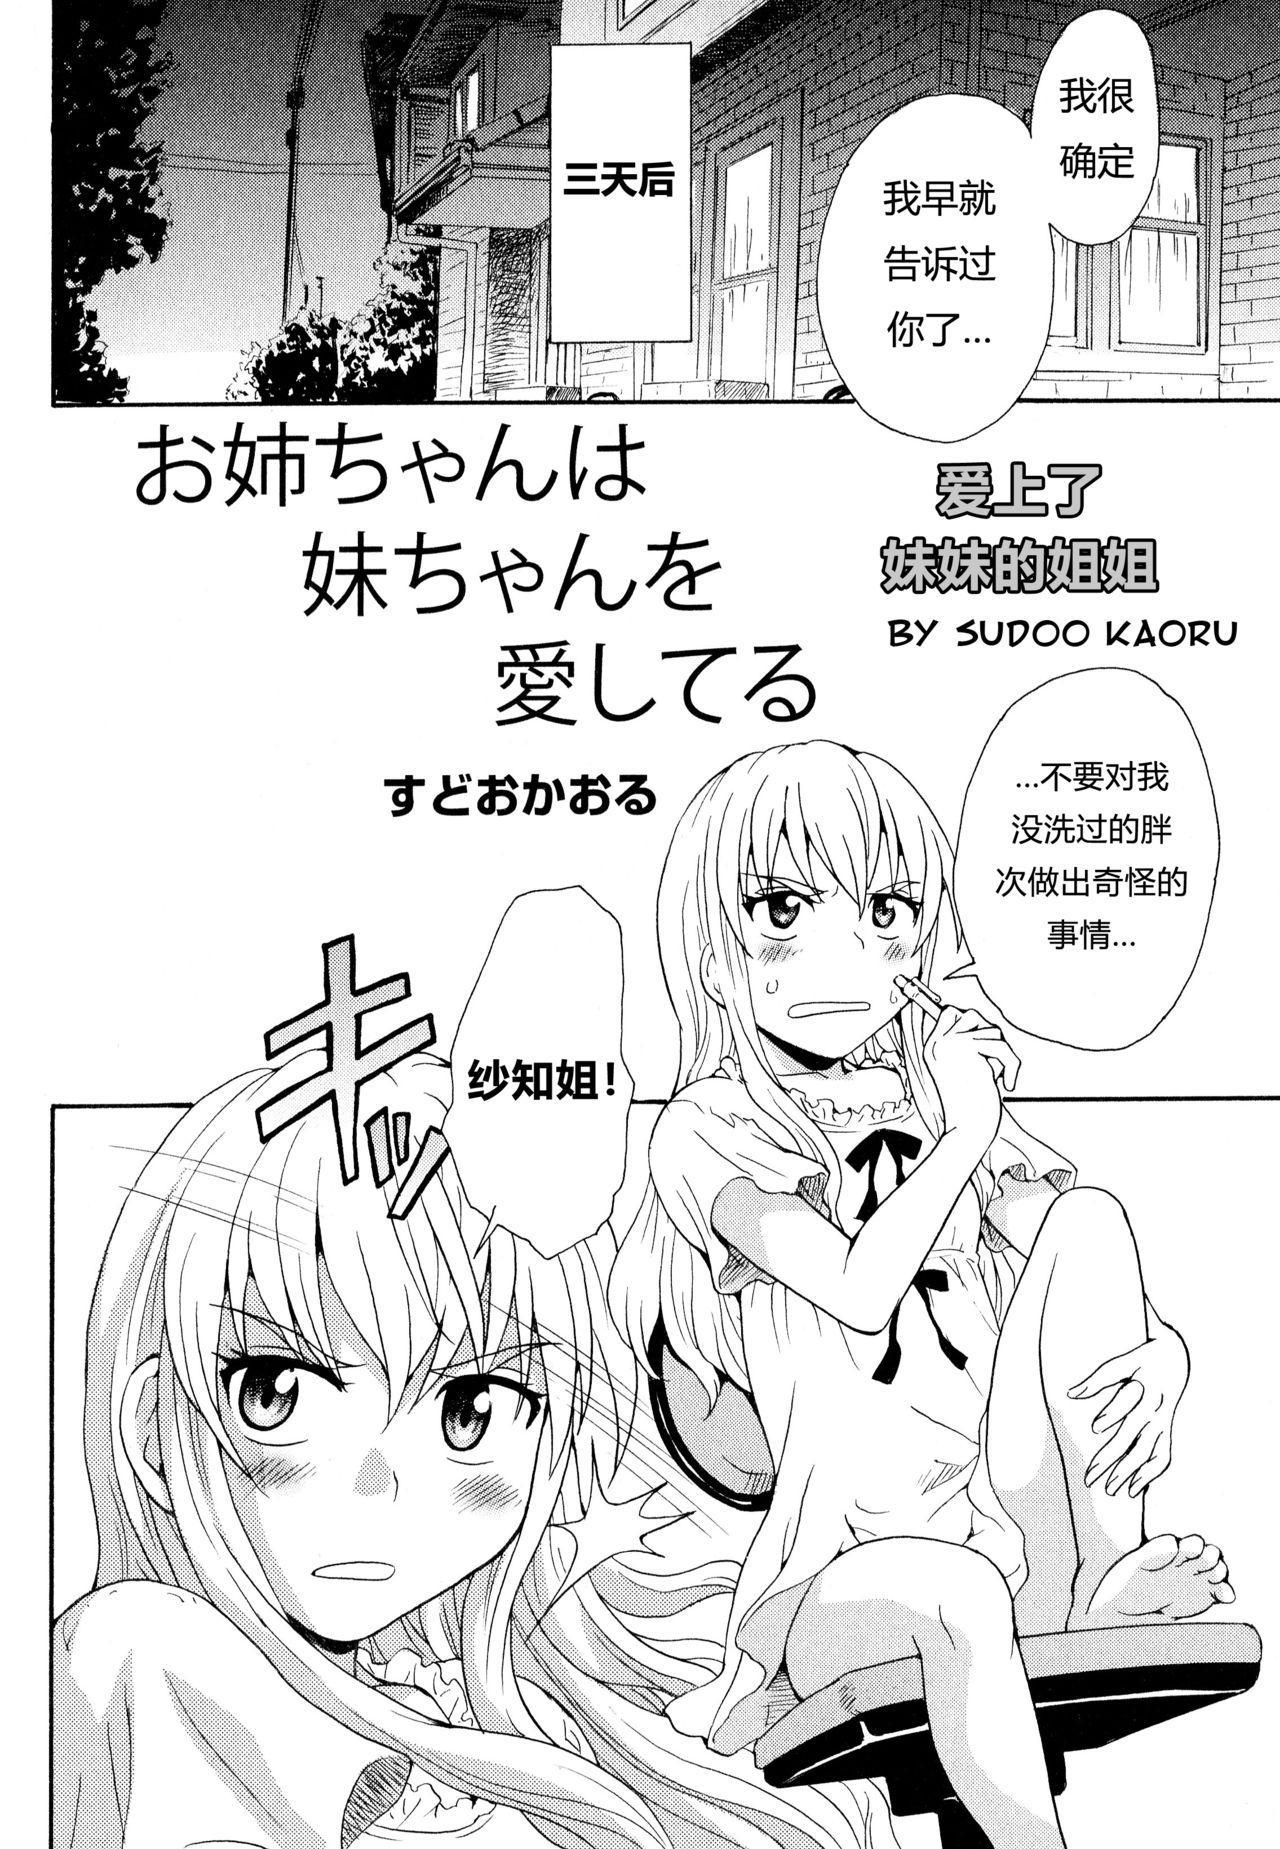 [Sudoo Kaoru] Onee-chan wa Imouto-chan o Aishiteru   爱上了妹妹的姐姐 (Aya Yuri Vol. 11) [Chinese] [SAW汉化组] 2